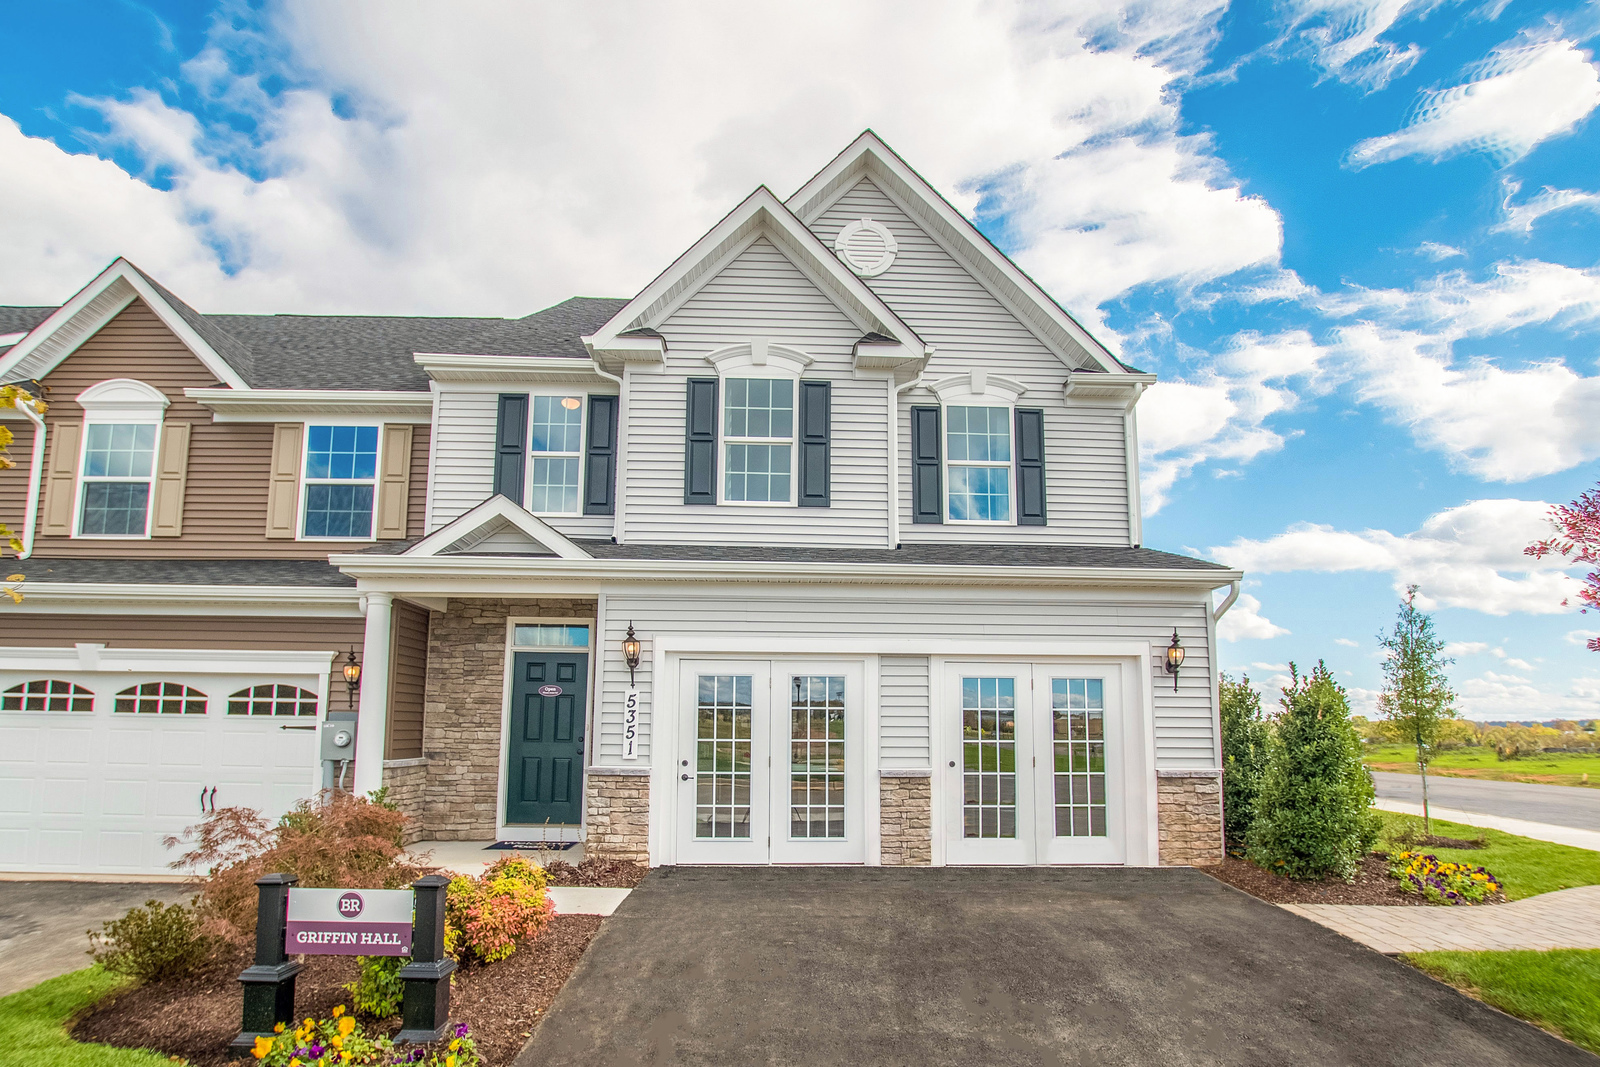 New Homes for sale at Ballenger Run Villas – Main Level